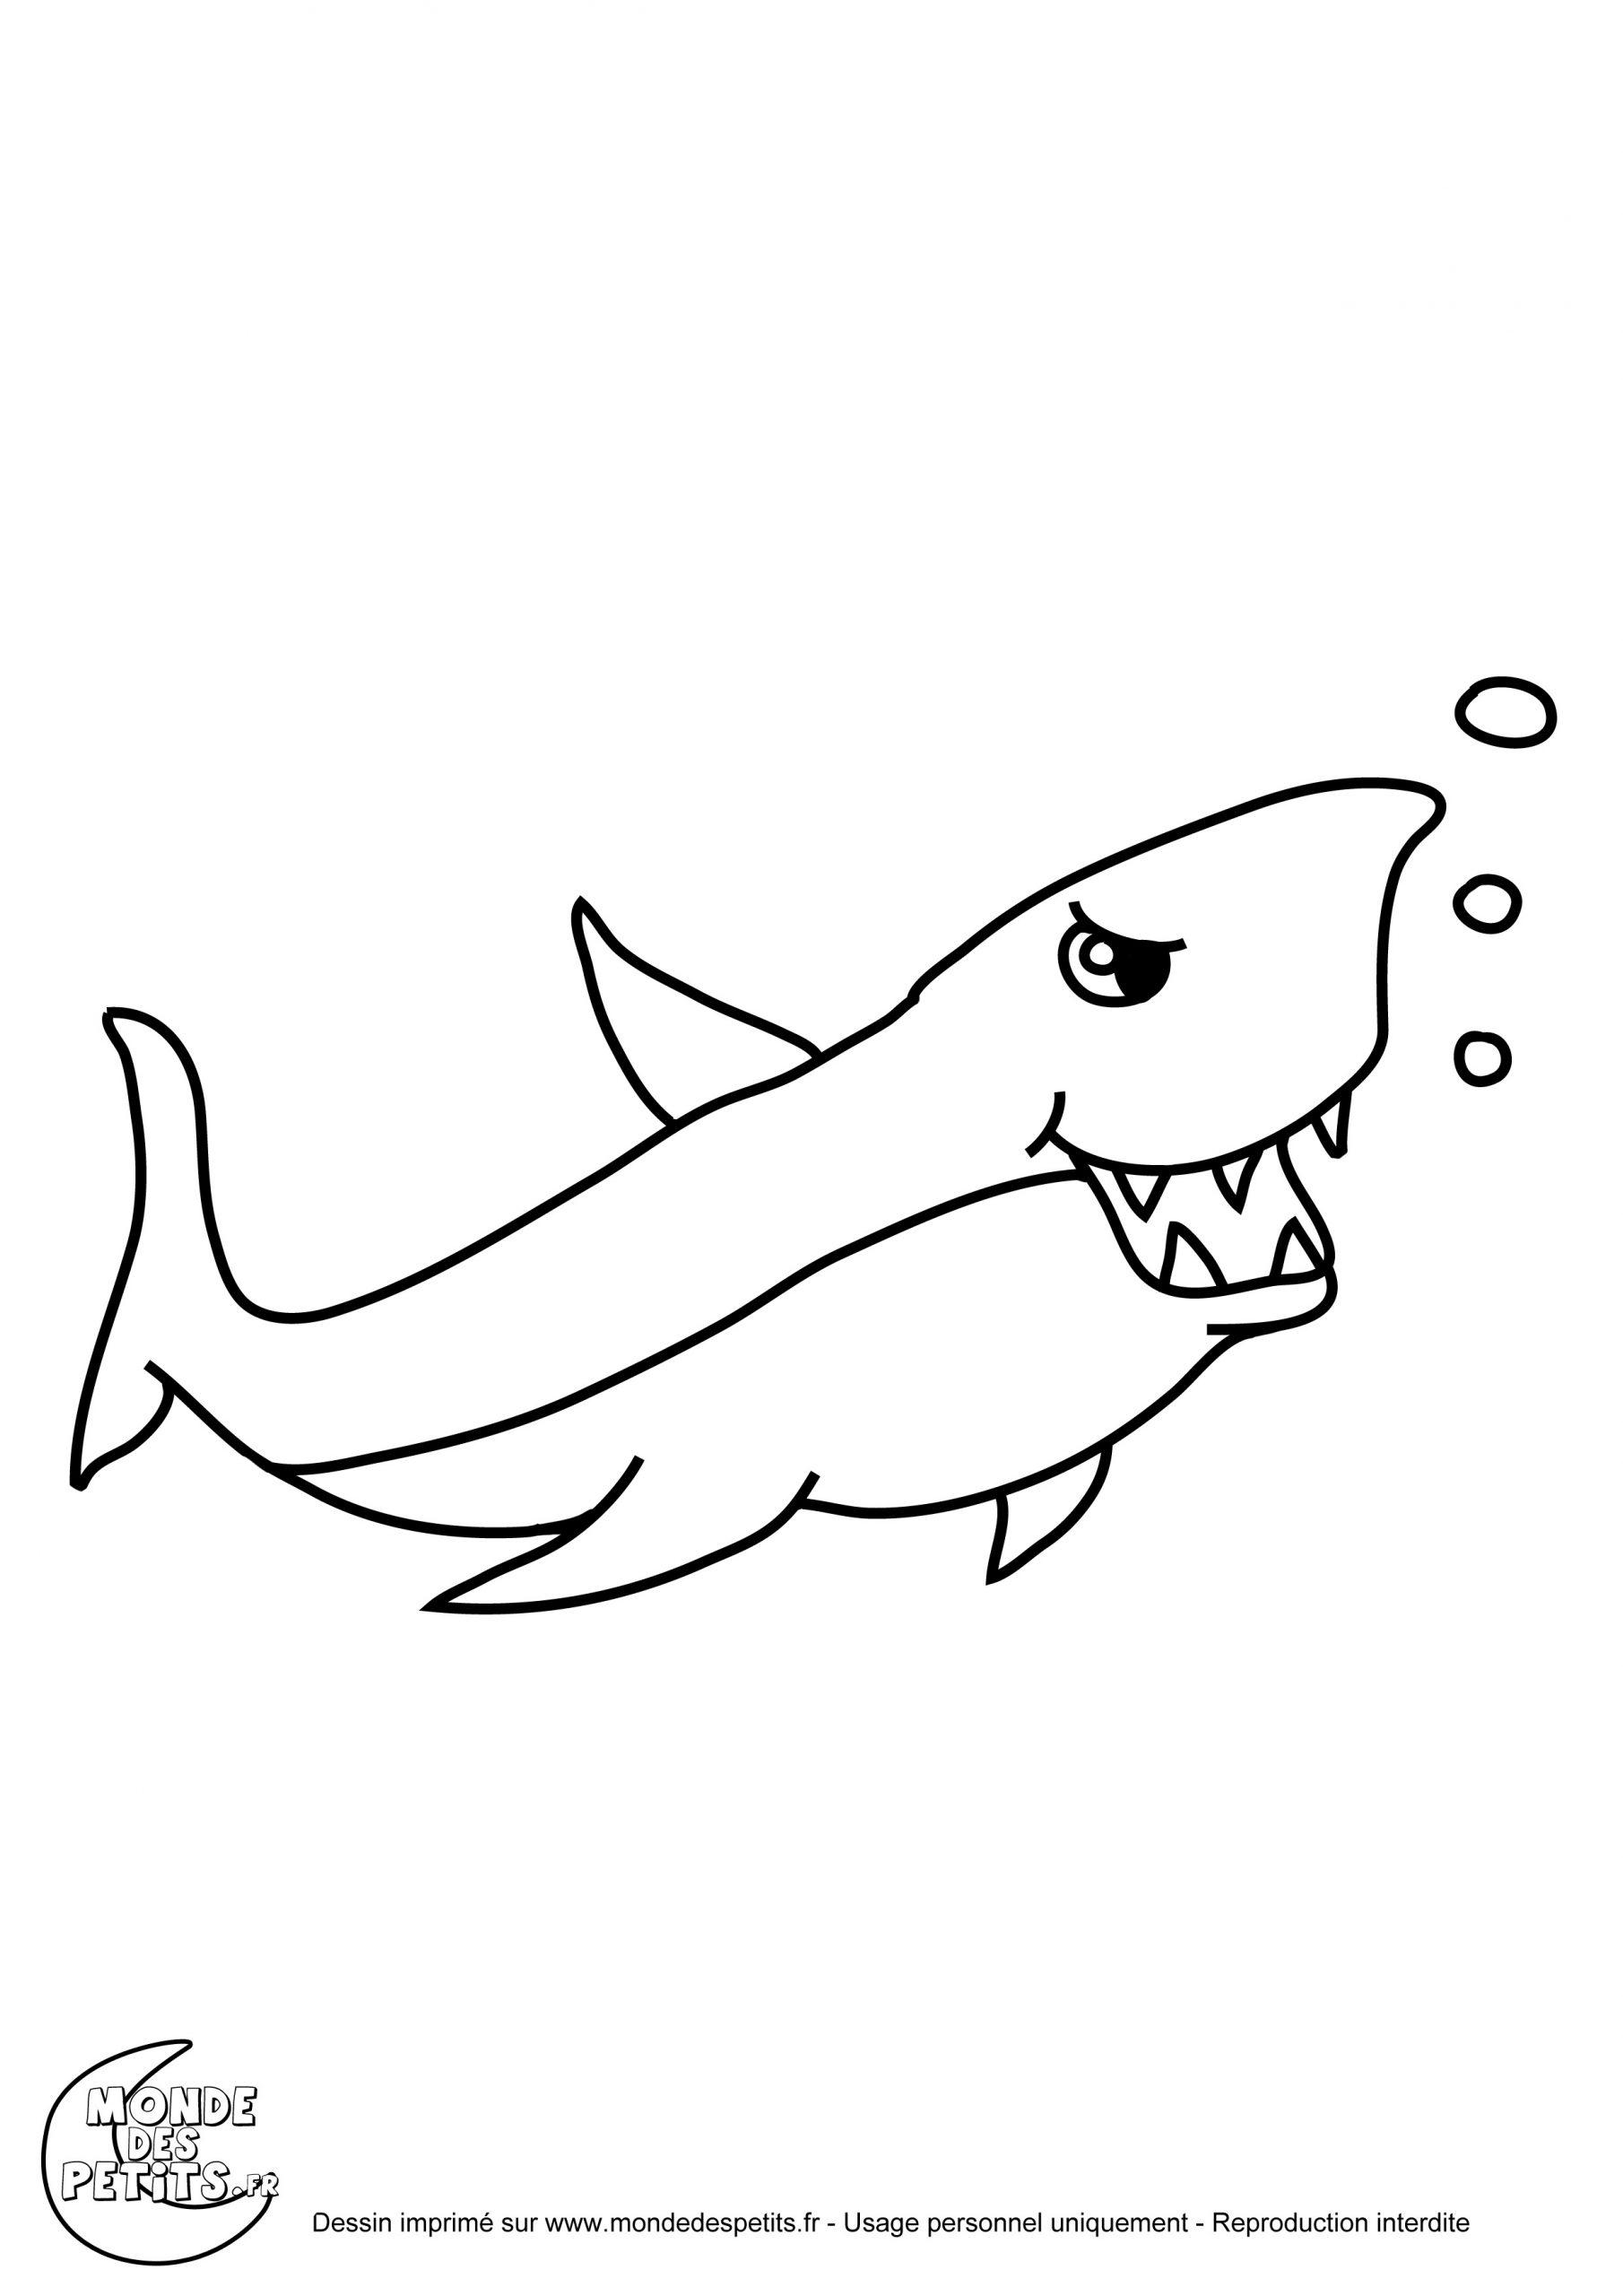 Dessin Requin Baleine Dessin concernant Coloriage Requin À Imprimer